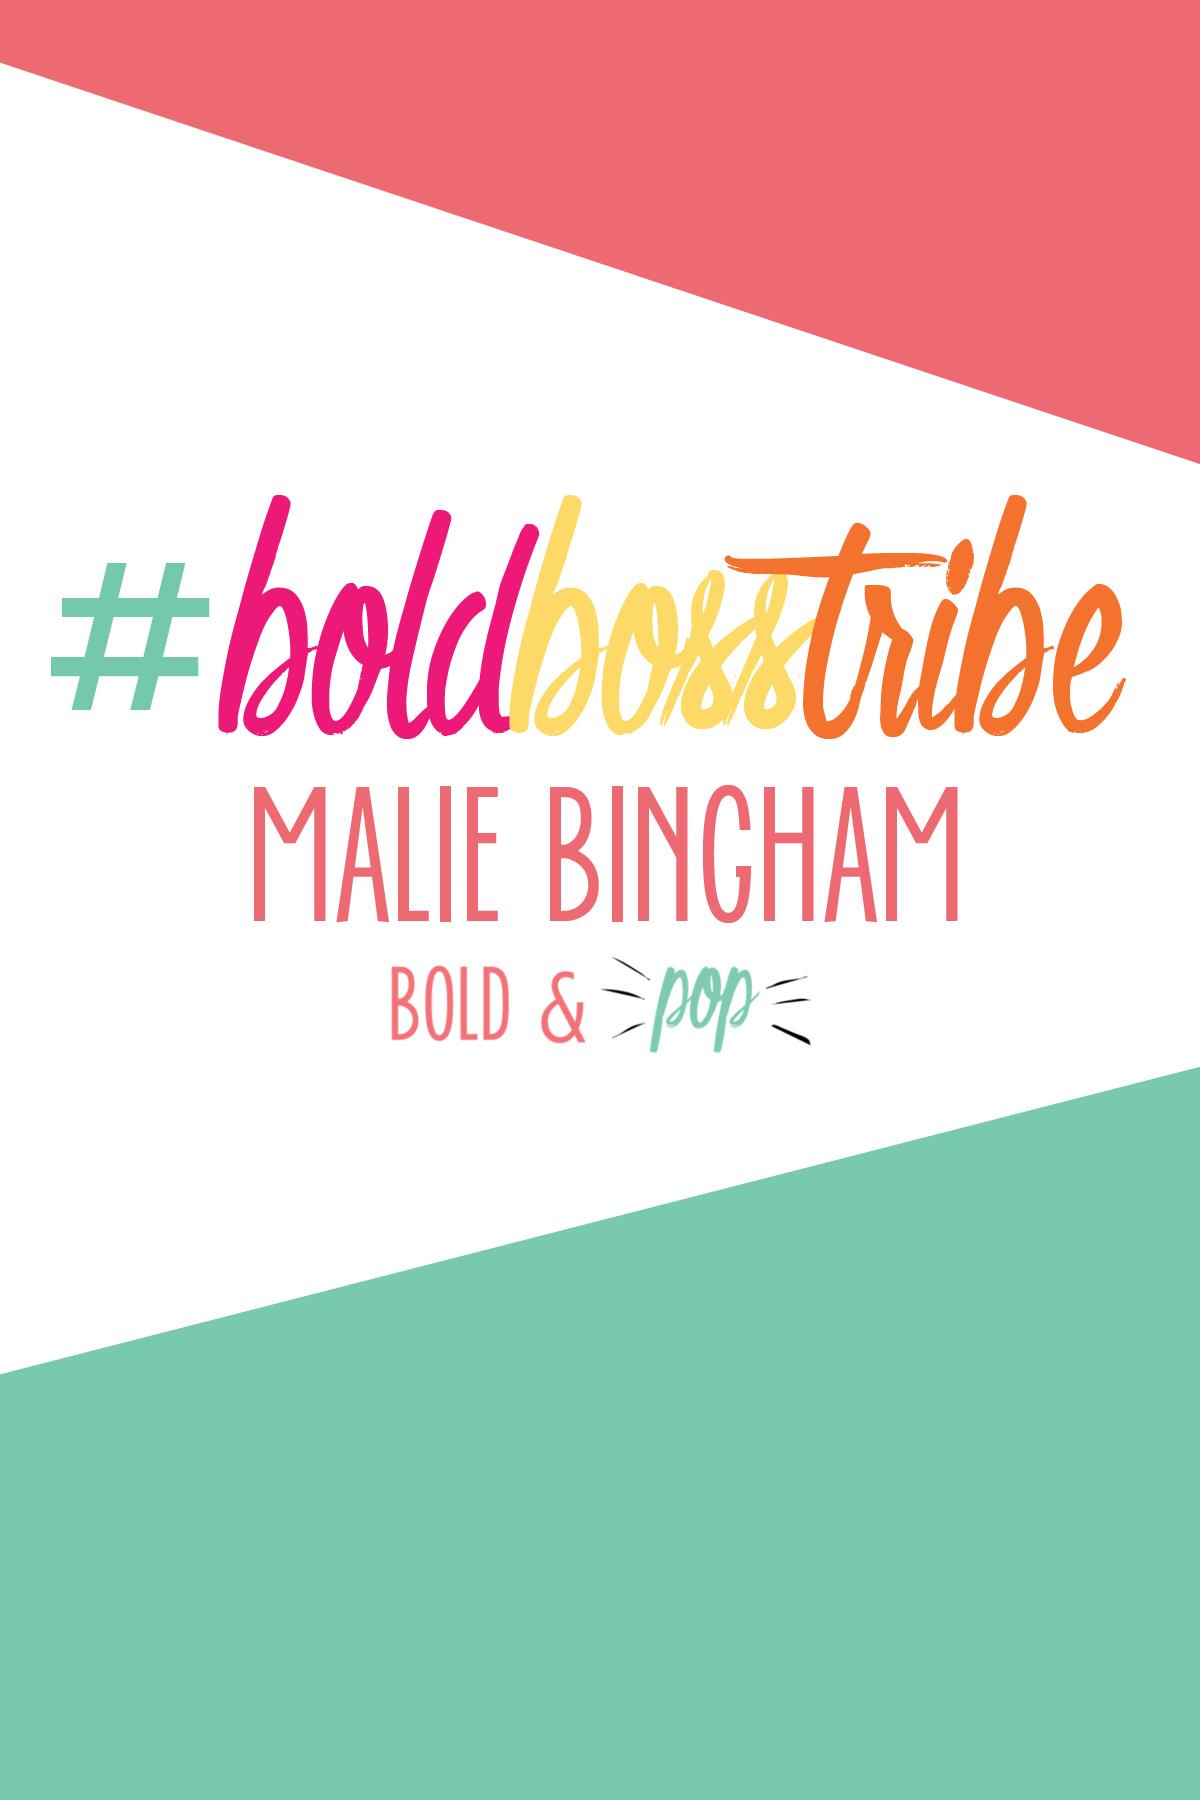 Bold & Pop : #BoldBosstribe Feature with Fashion Designer turned Fashion Career Coach Malie Bingham of Pick Glass